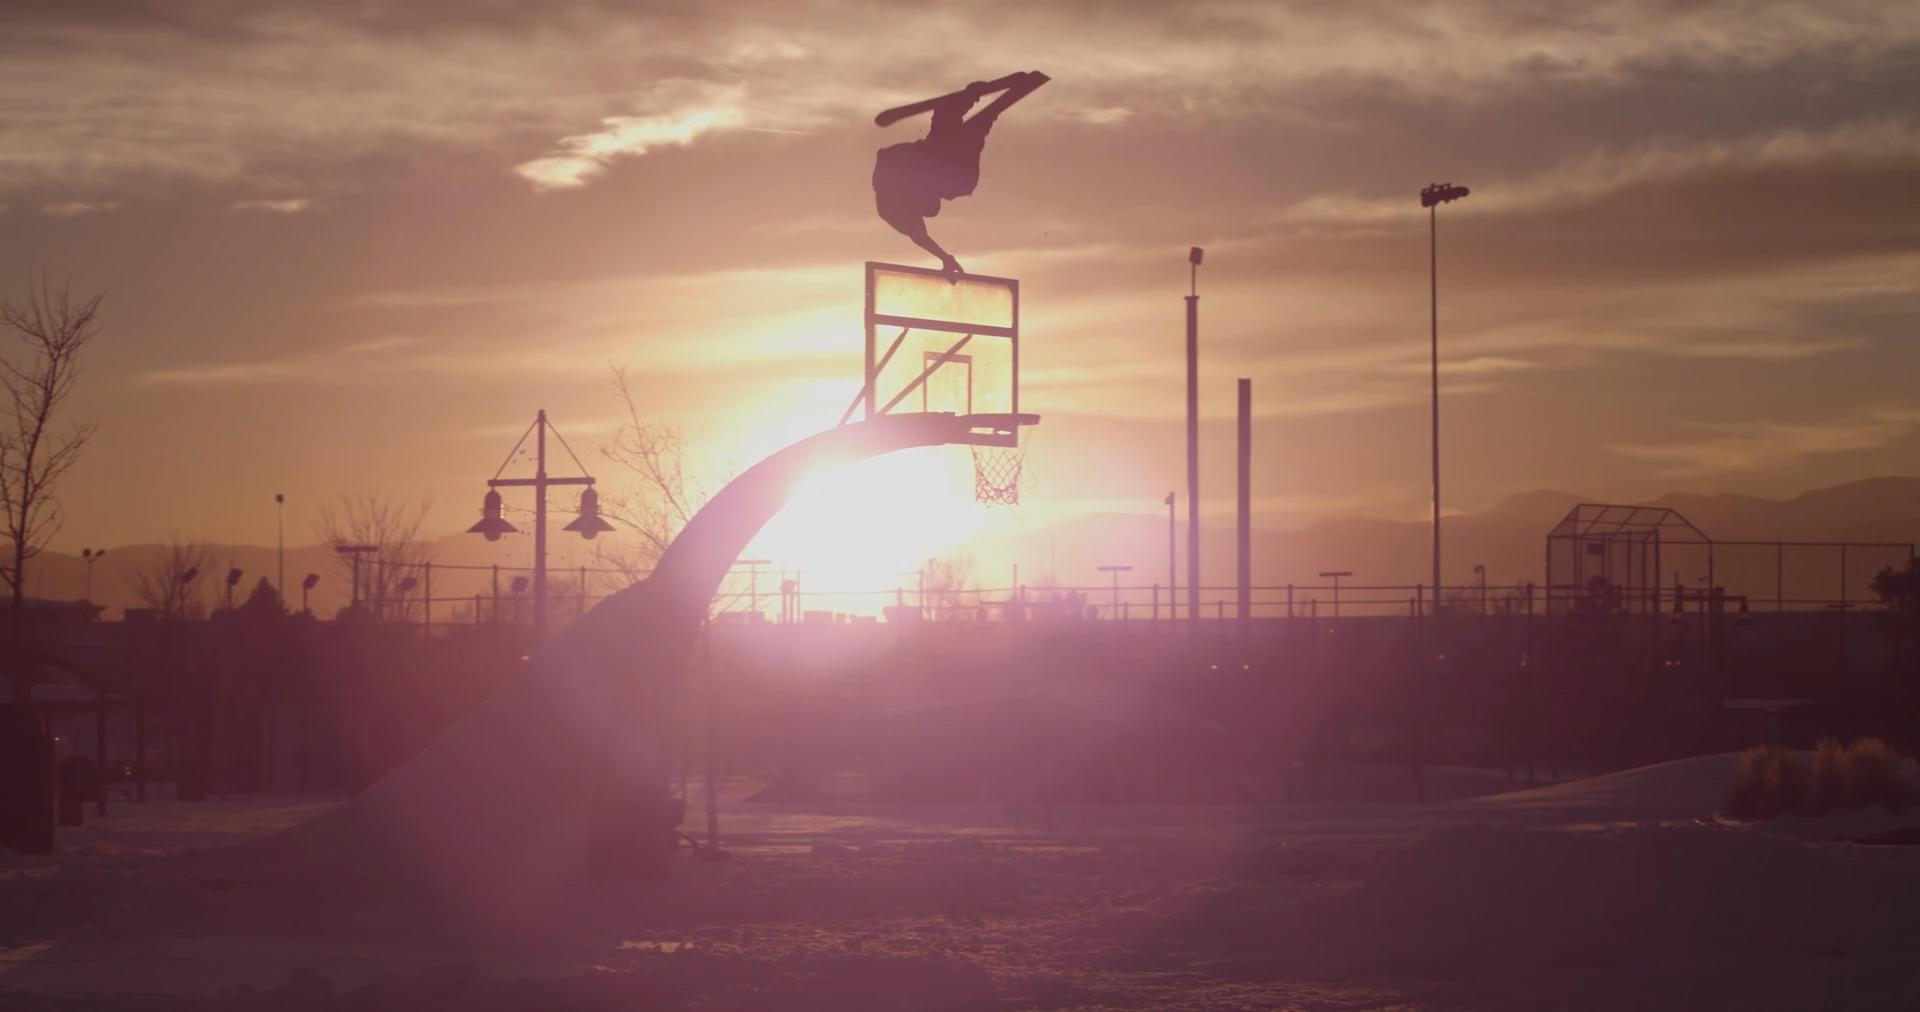 uk.news.yahoo.com: Guy Skis Over Basketball Pole And Lands Perfectly